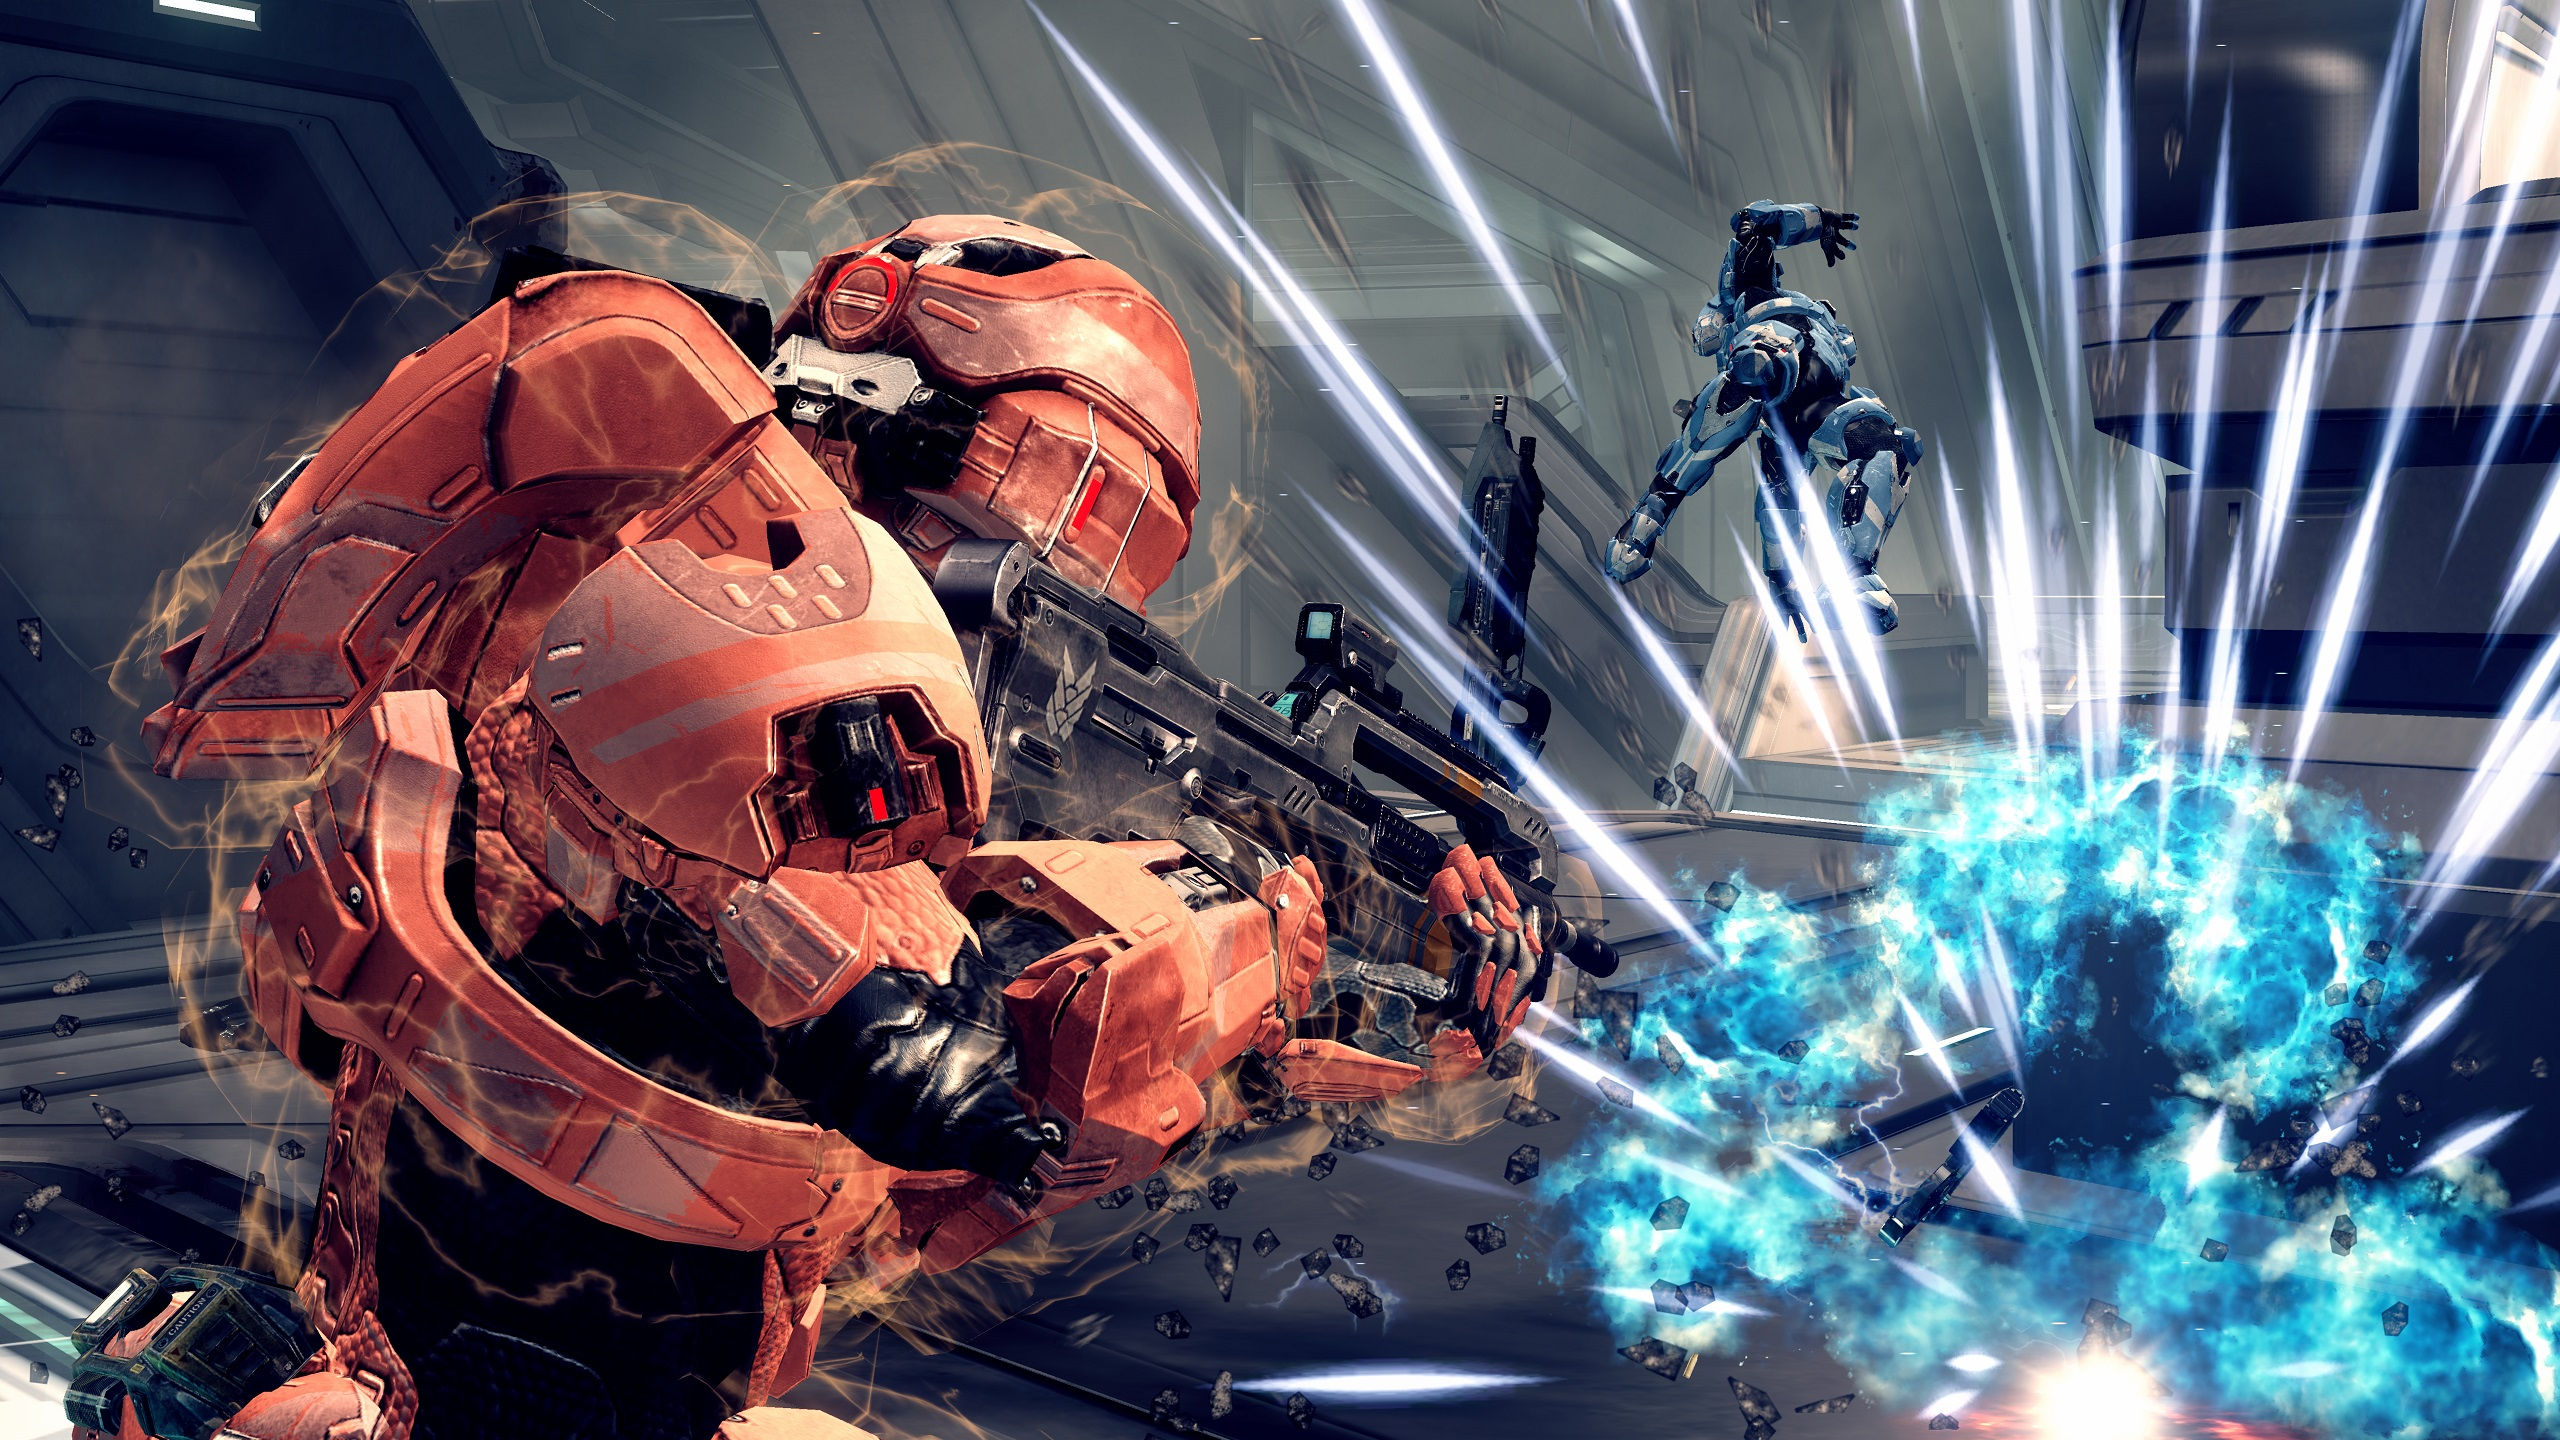 2012-11-06-halo4_multiplayerwraparound02.jpg